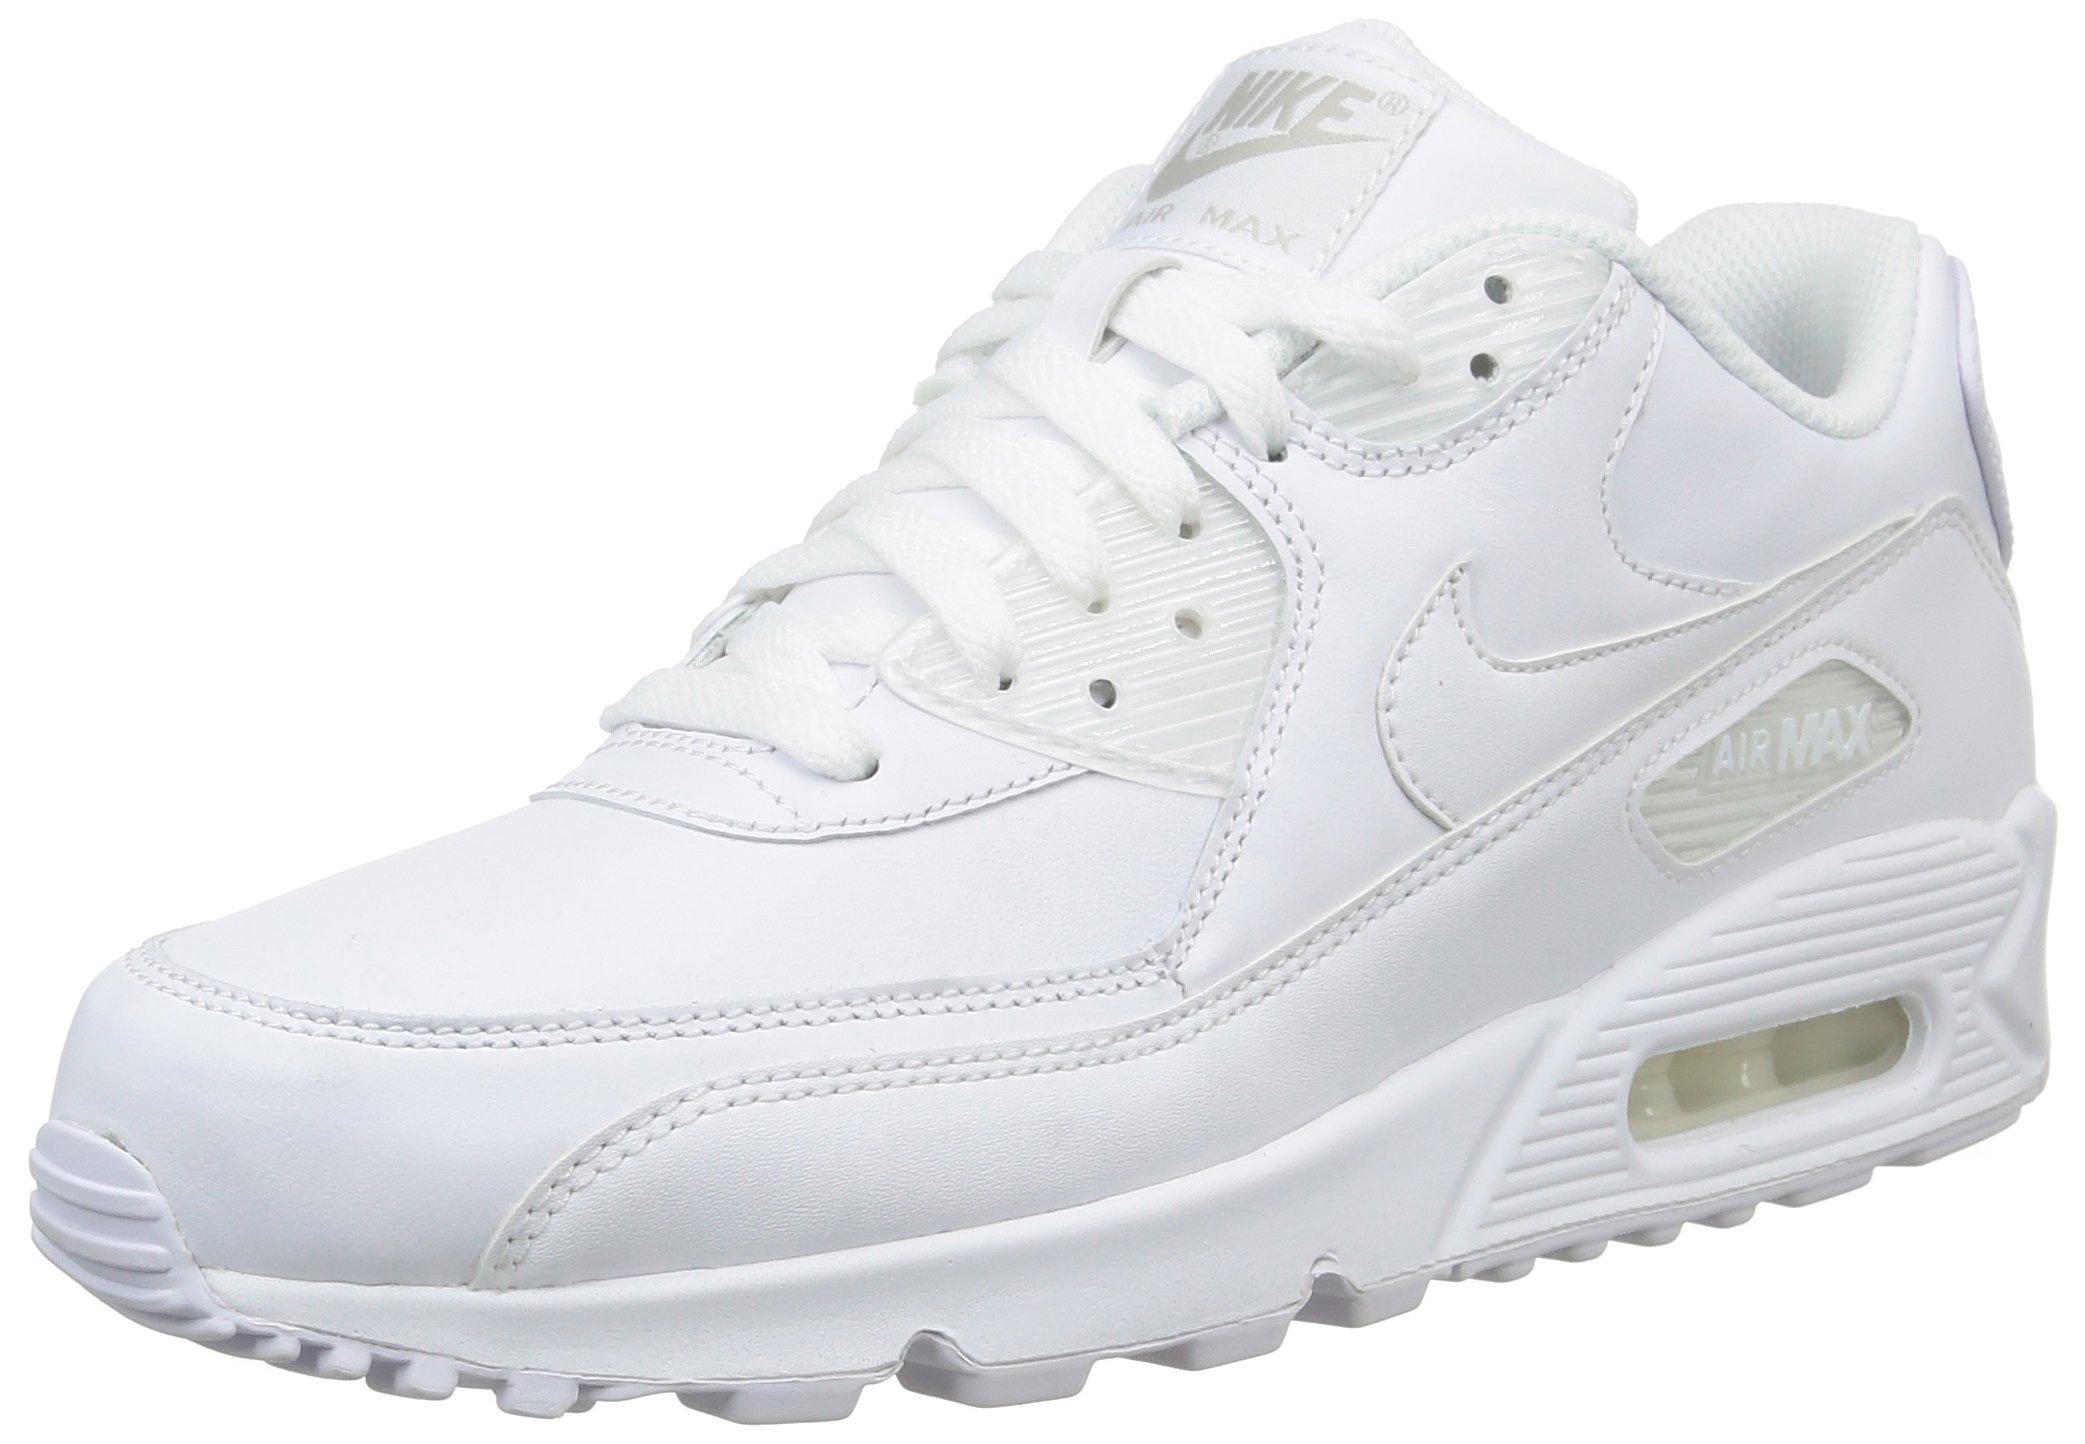 Air Max White38 LeatherDerby 90 Nike HommeBlanctrue true White 5 Eu OkXiwZuPT